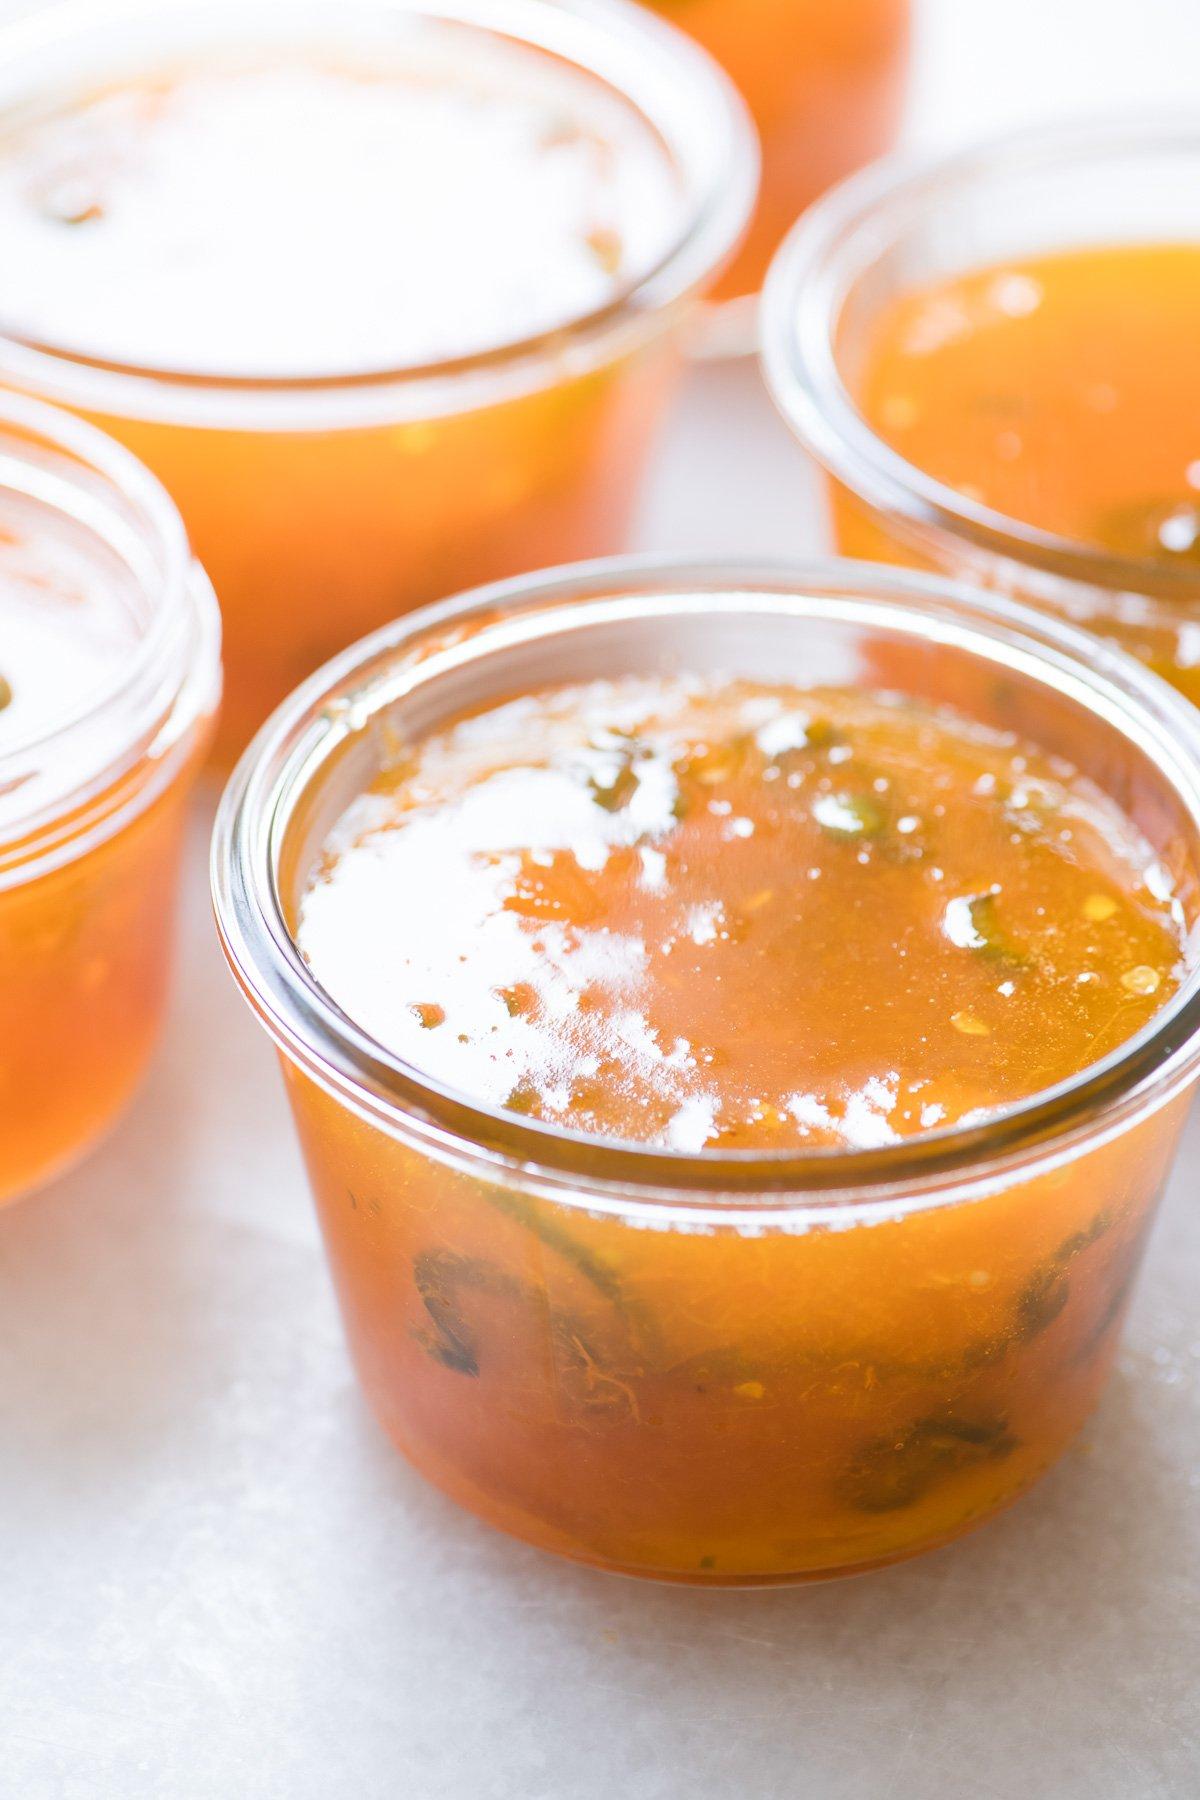 Apricot Jalapeño Jam in canning jars